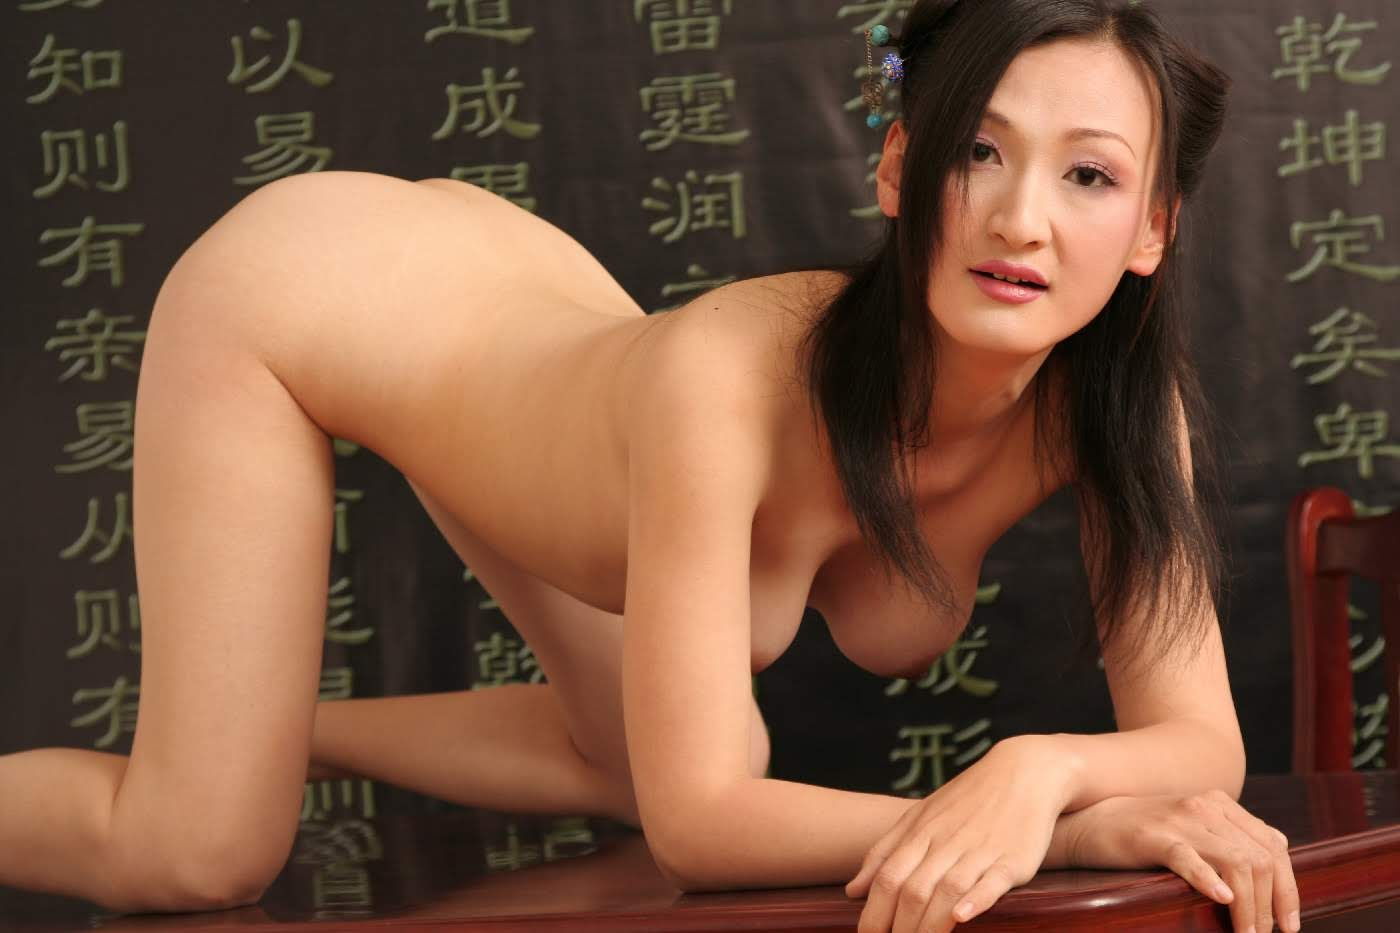 MetCN Naked_Girls-057-2008-12-25-Carina_Lau re